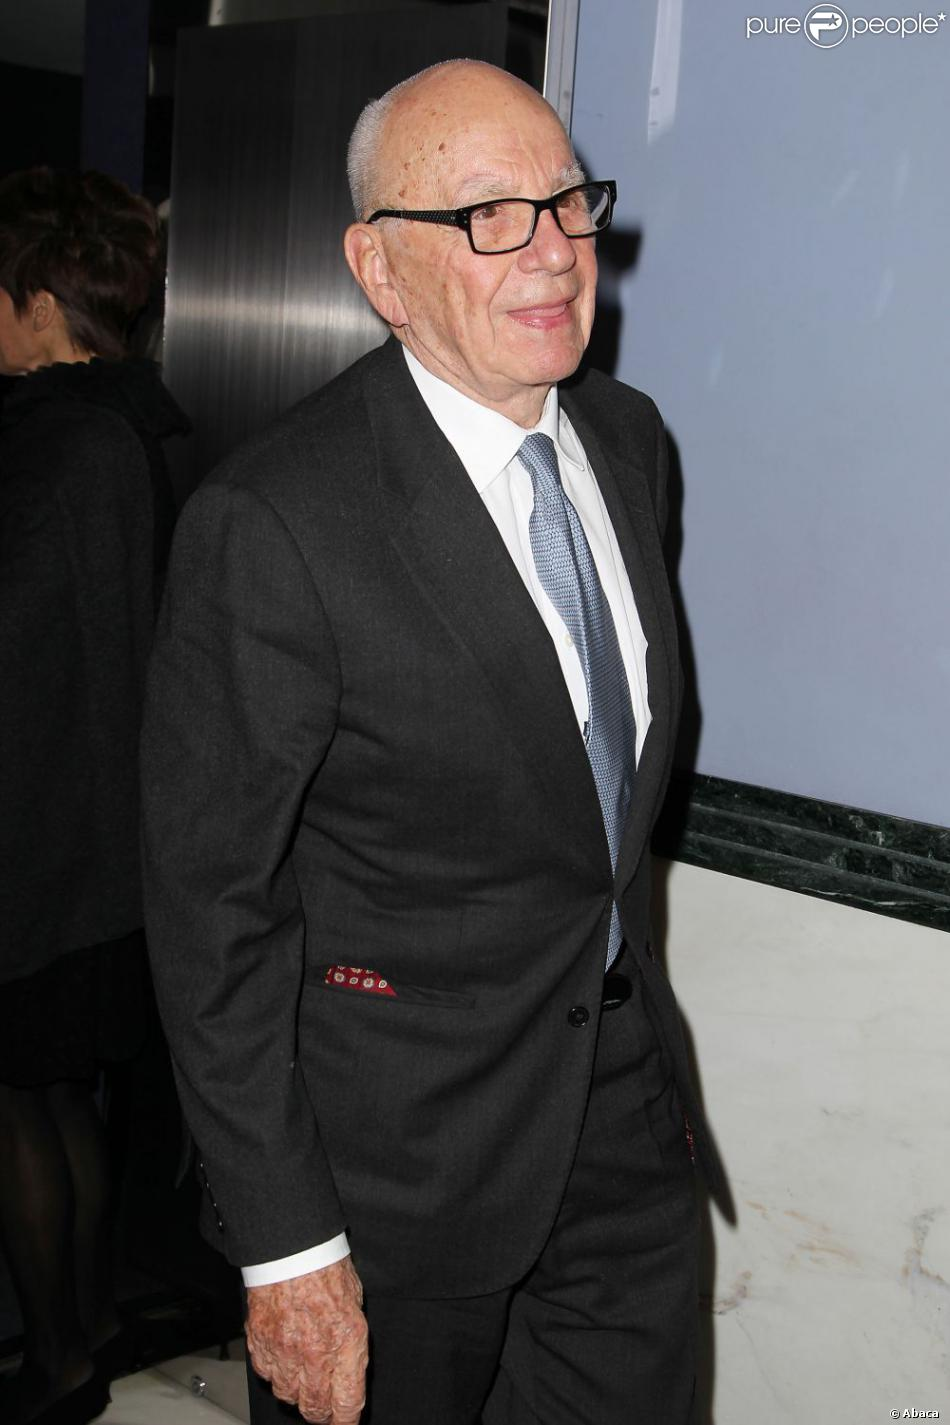 Rupert Murdoch à New York le 5 novembre 2012.